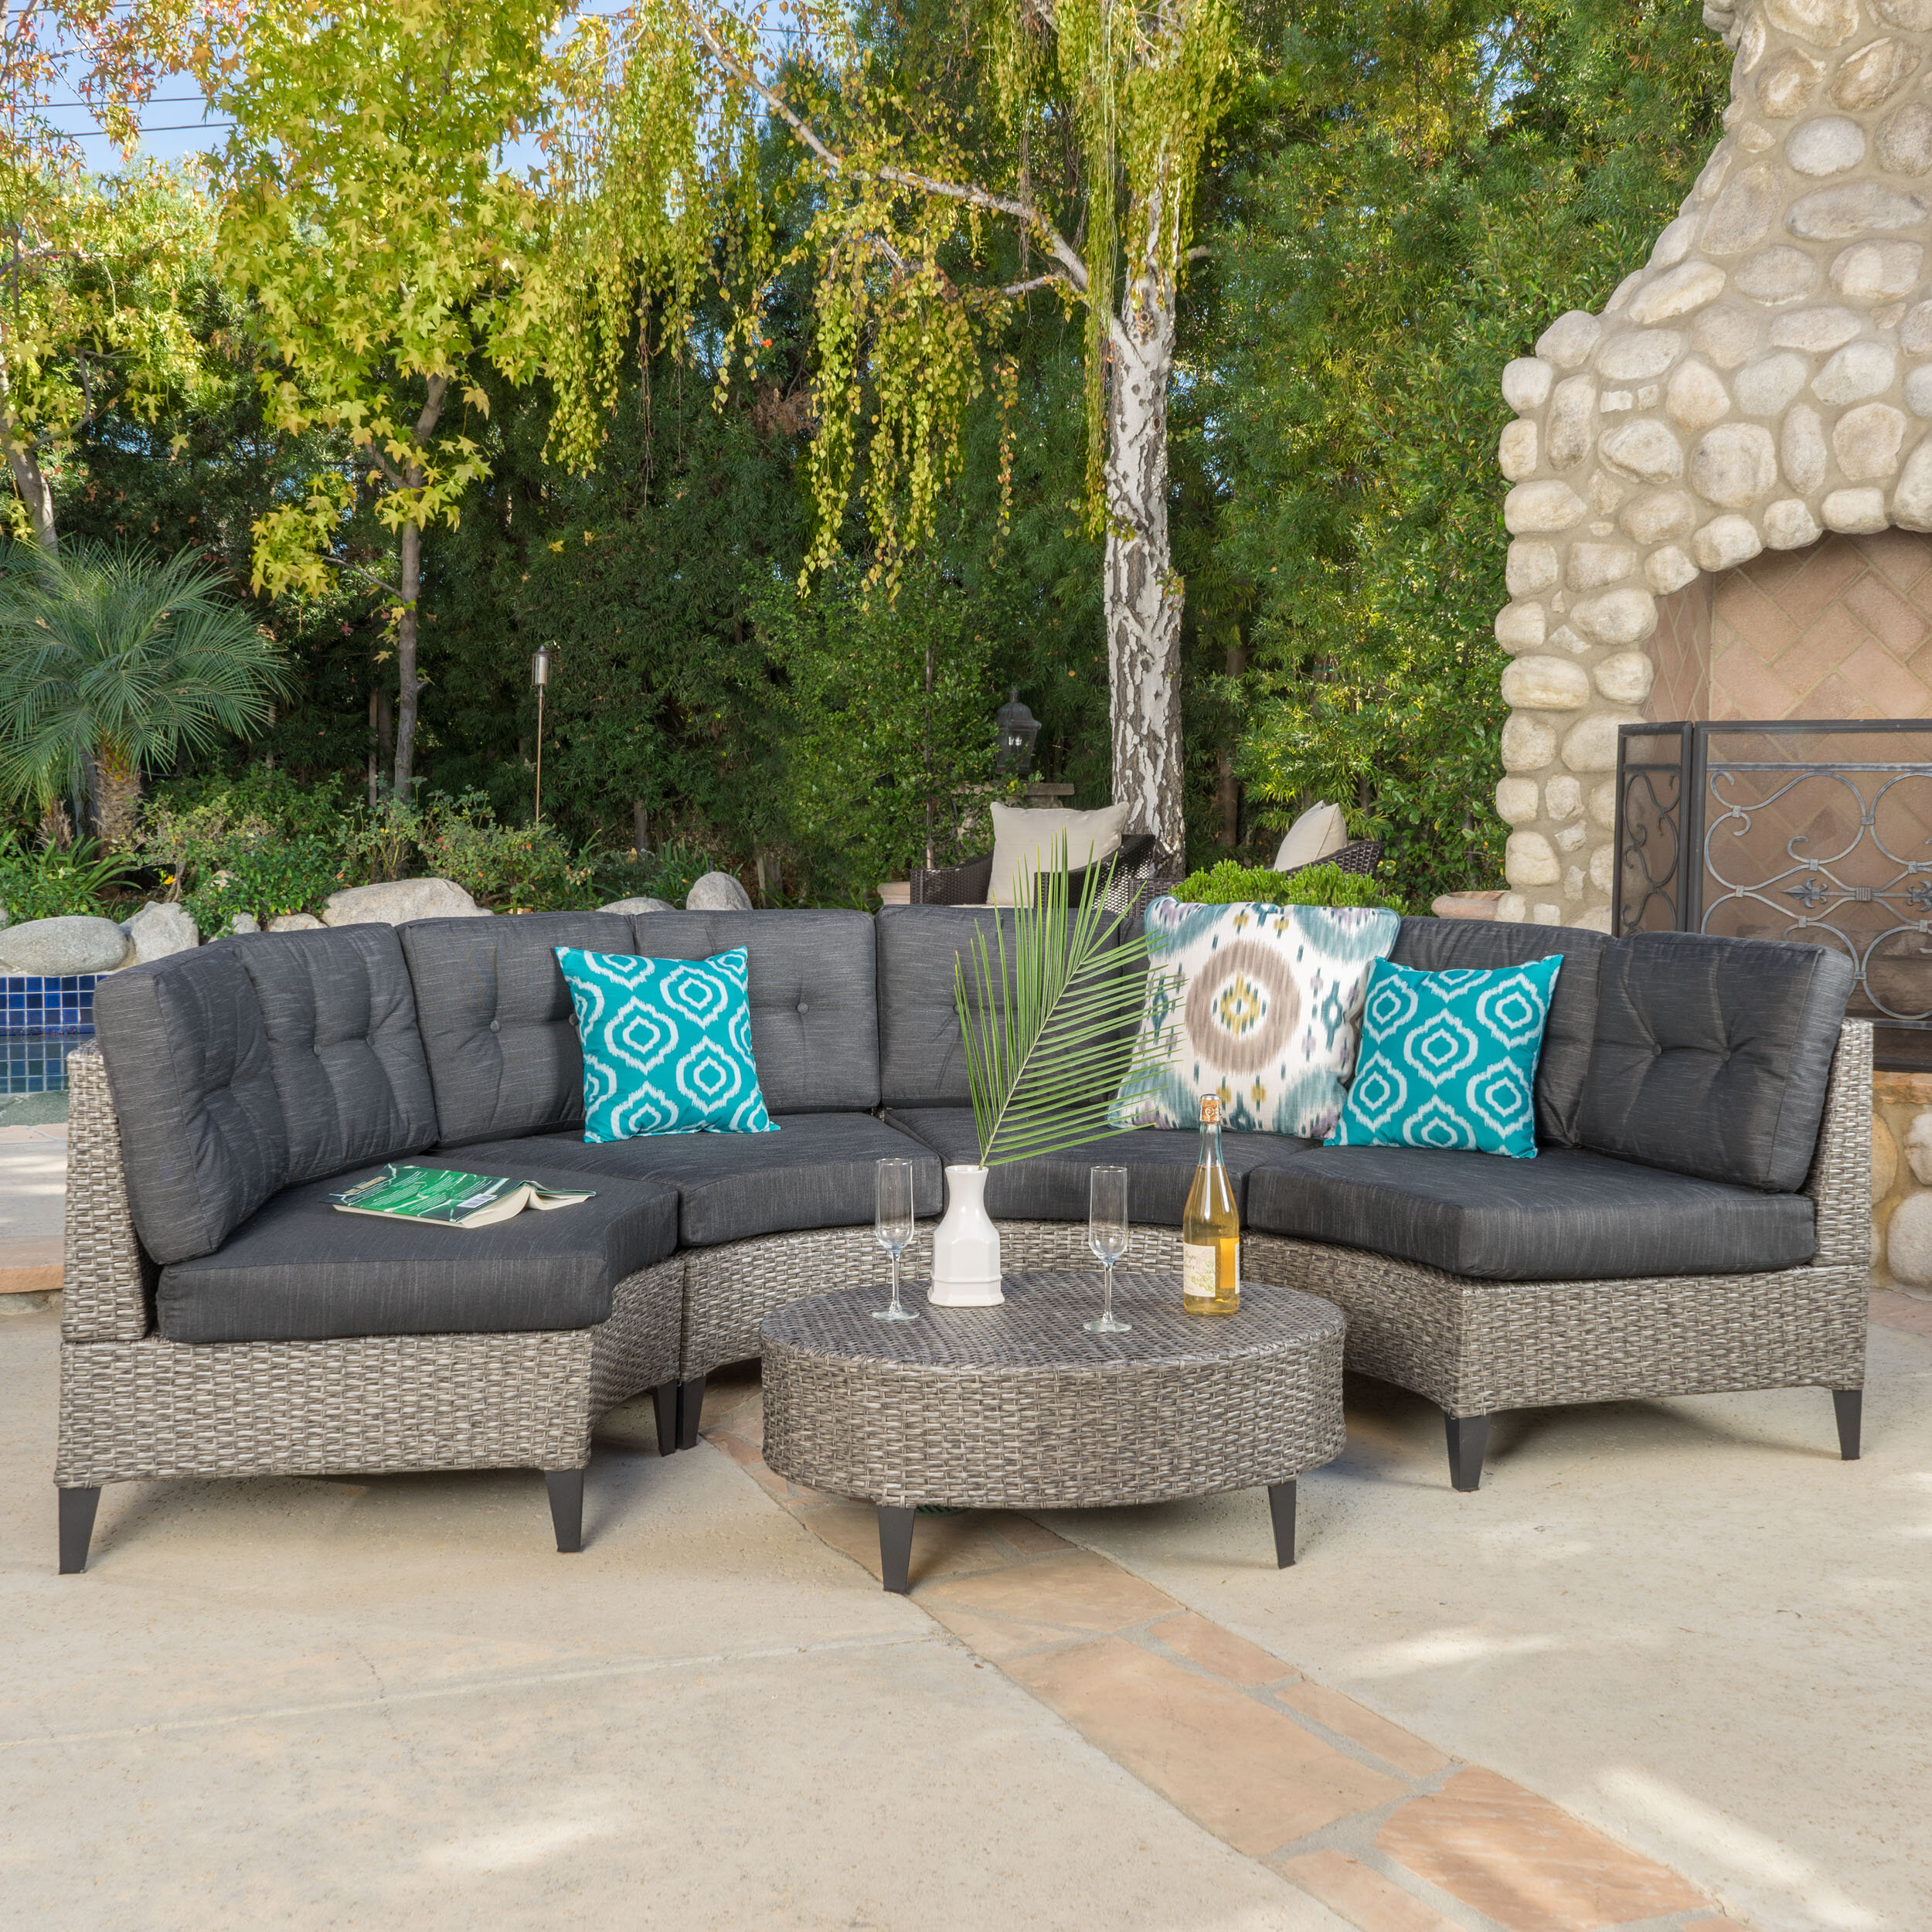 Brayden Studio Stoneman 5 Piece Rattan Sofa Set With Cushions Reviews Wayfair